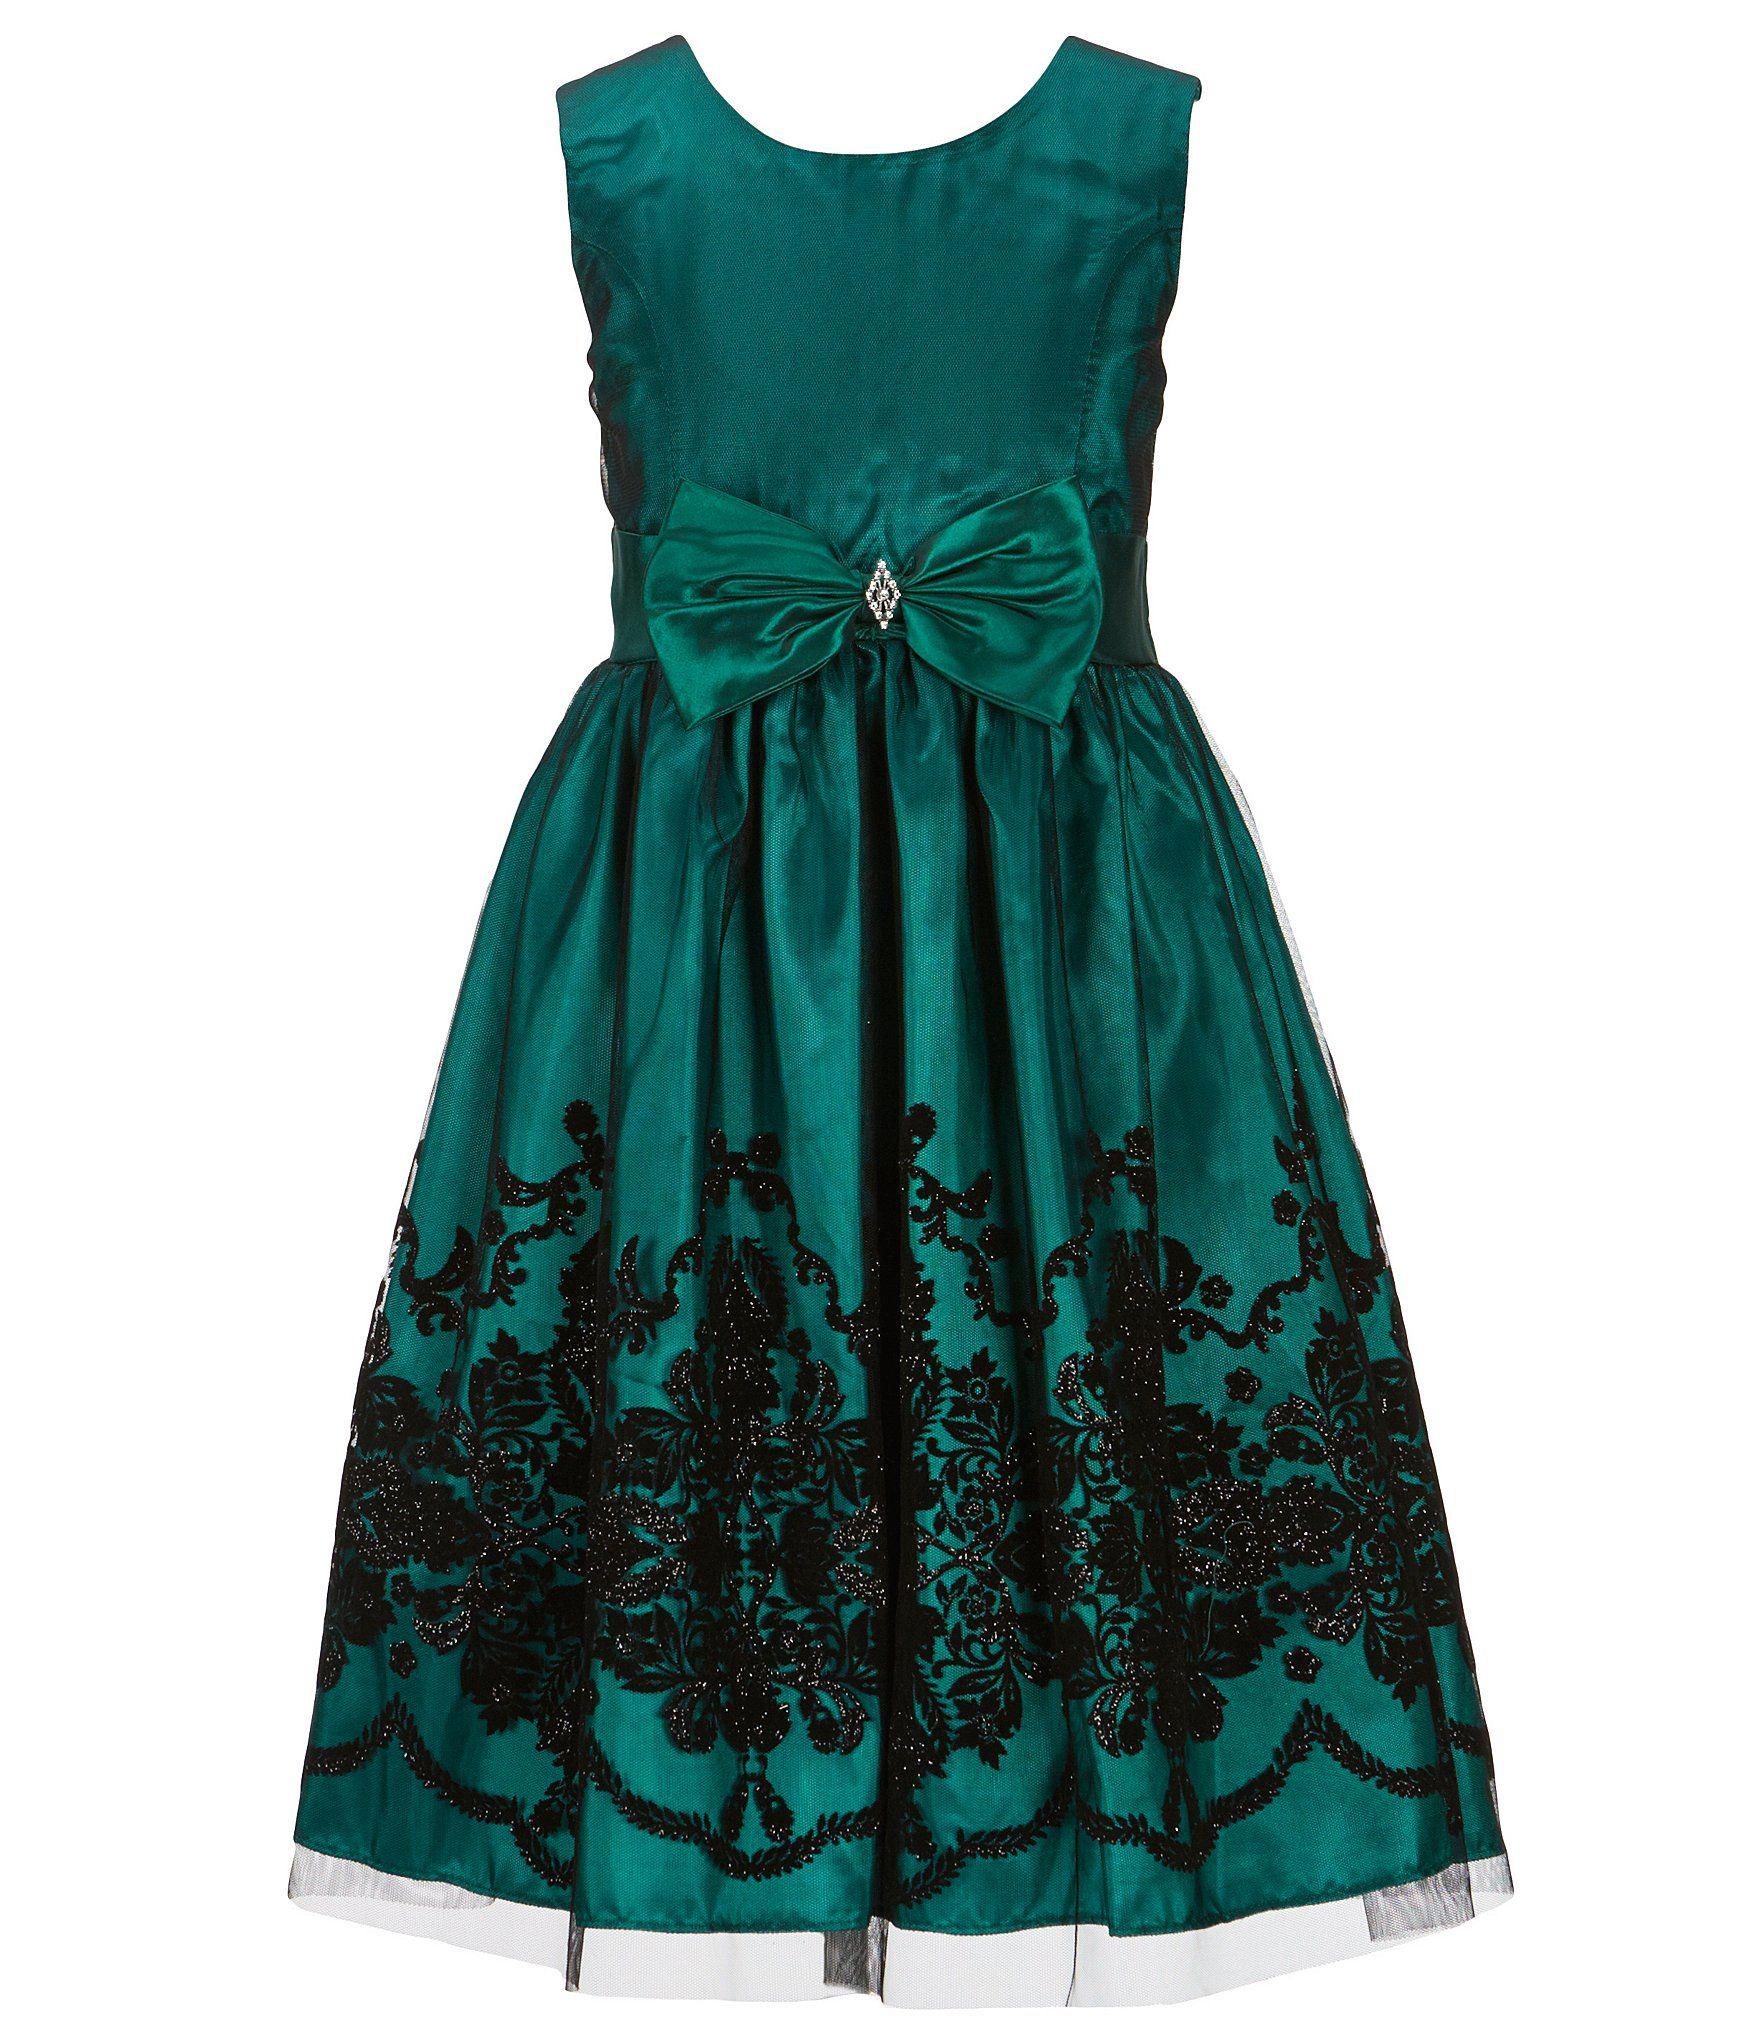 0abdd85ee1 Shop for Jayne Copeland Little Girls 2T-6X Flocked Bow Dress at ...